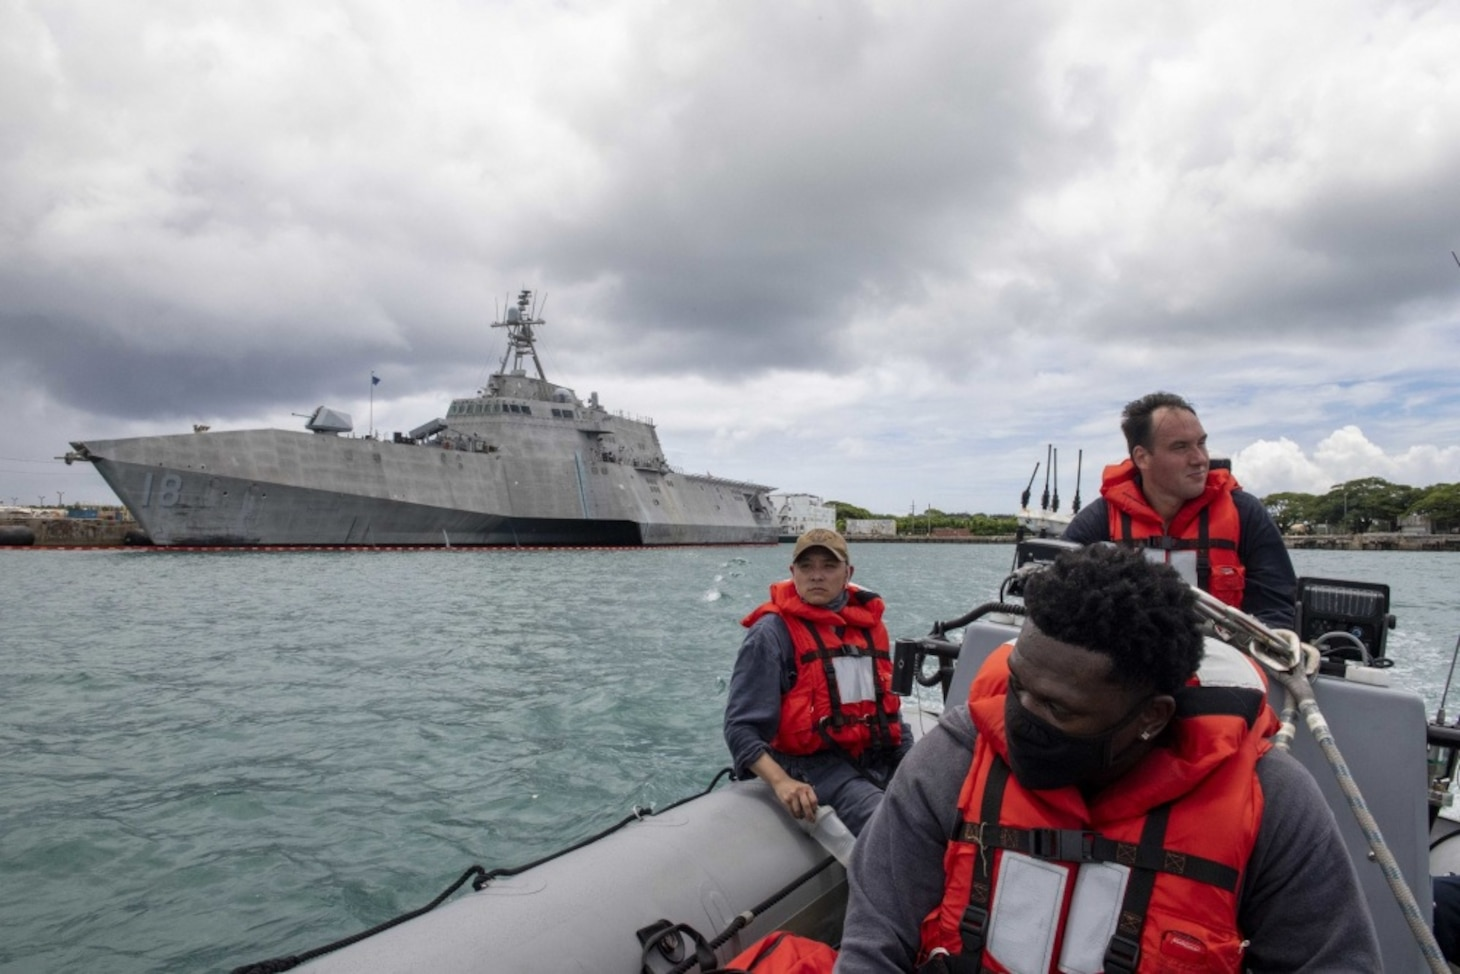 USS Charleston (LCS 18) meet up with USNS Millinocket